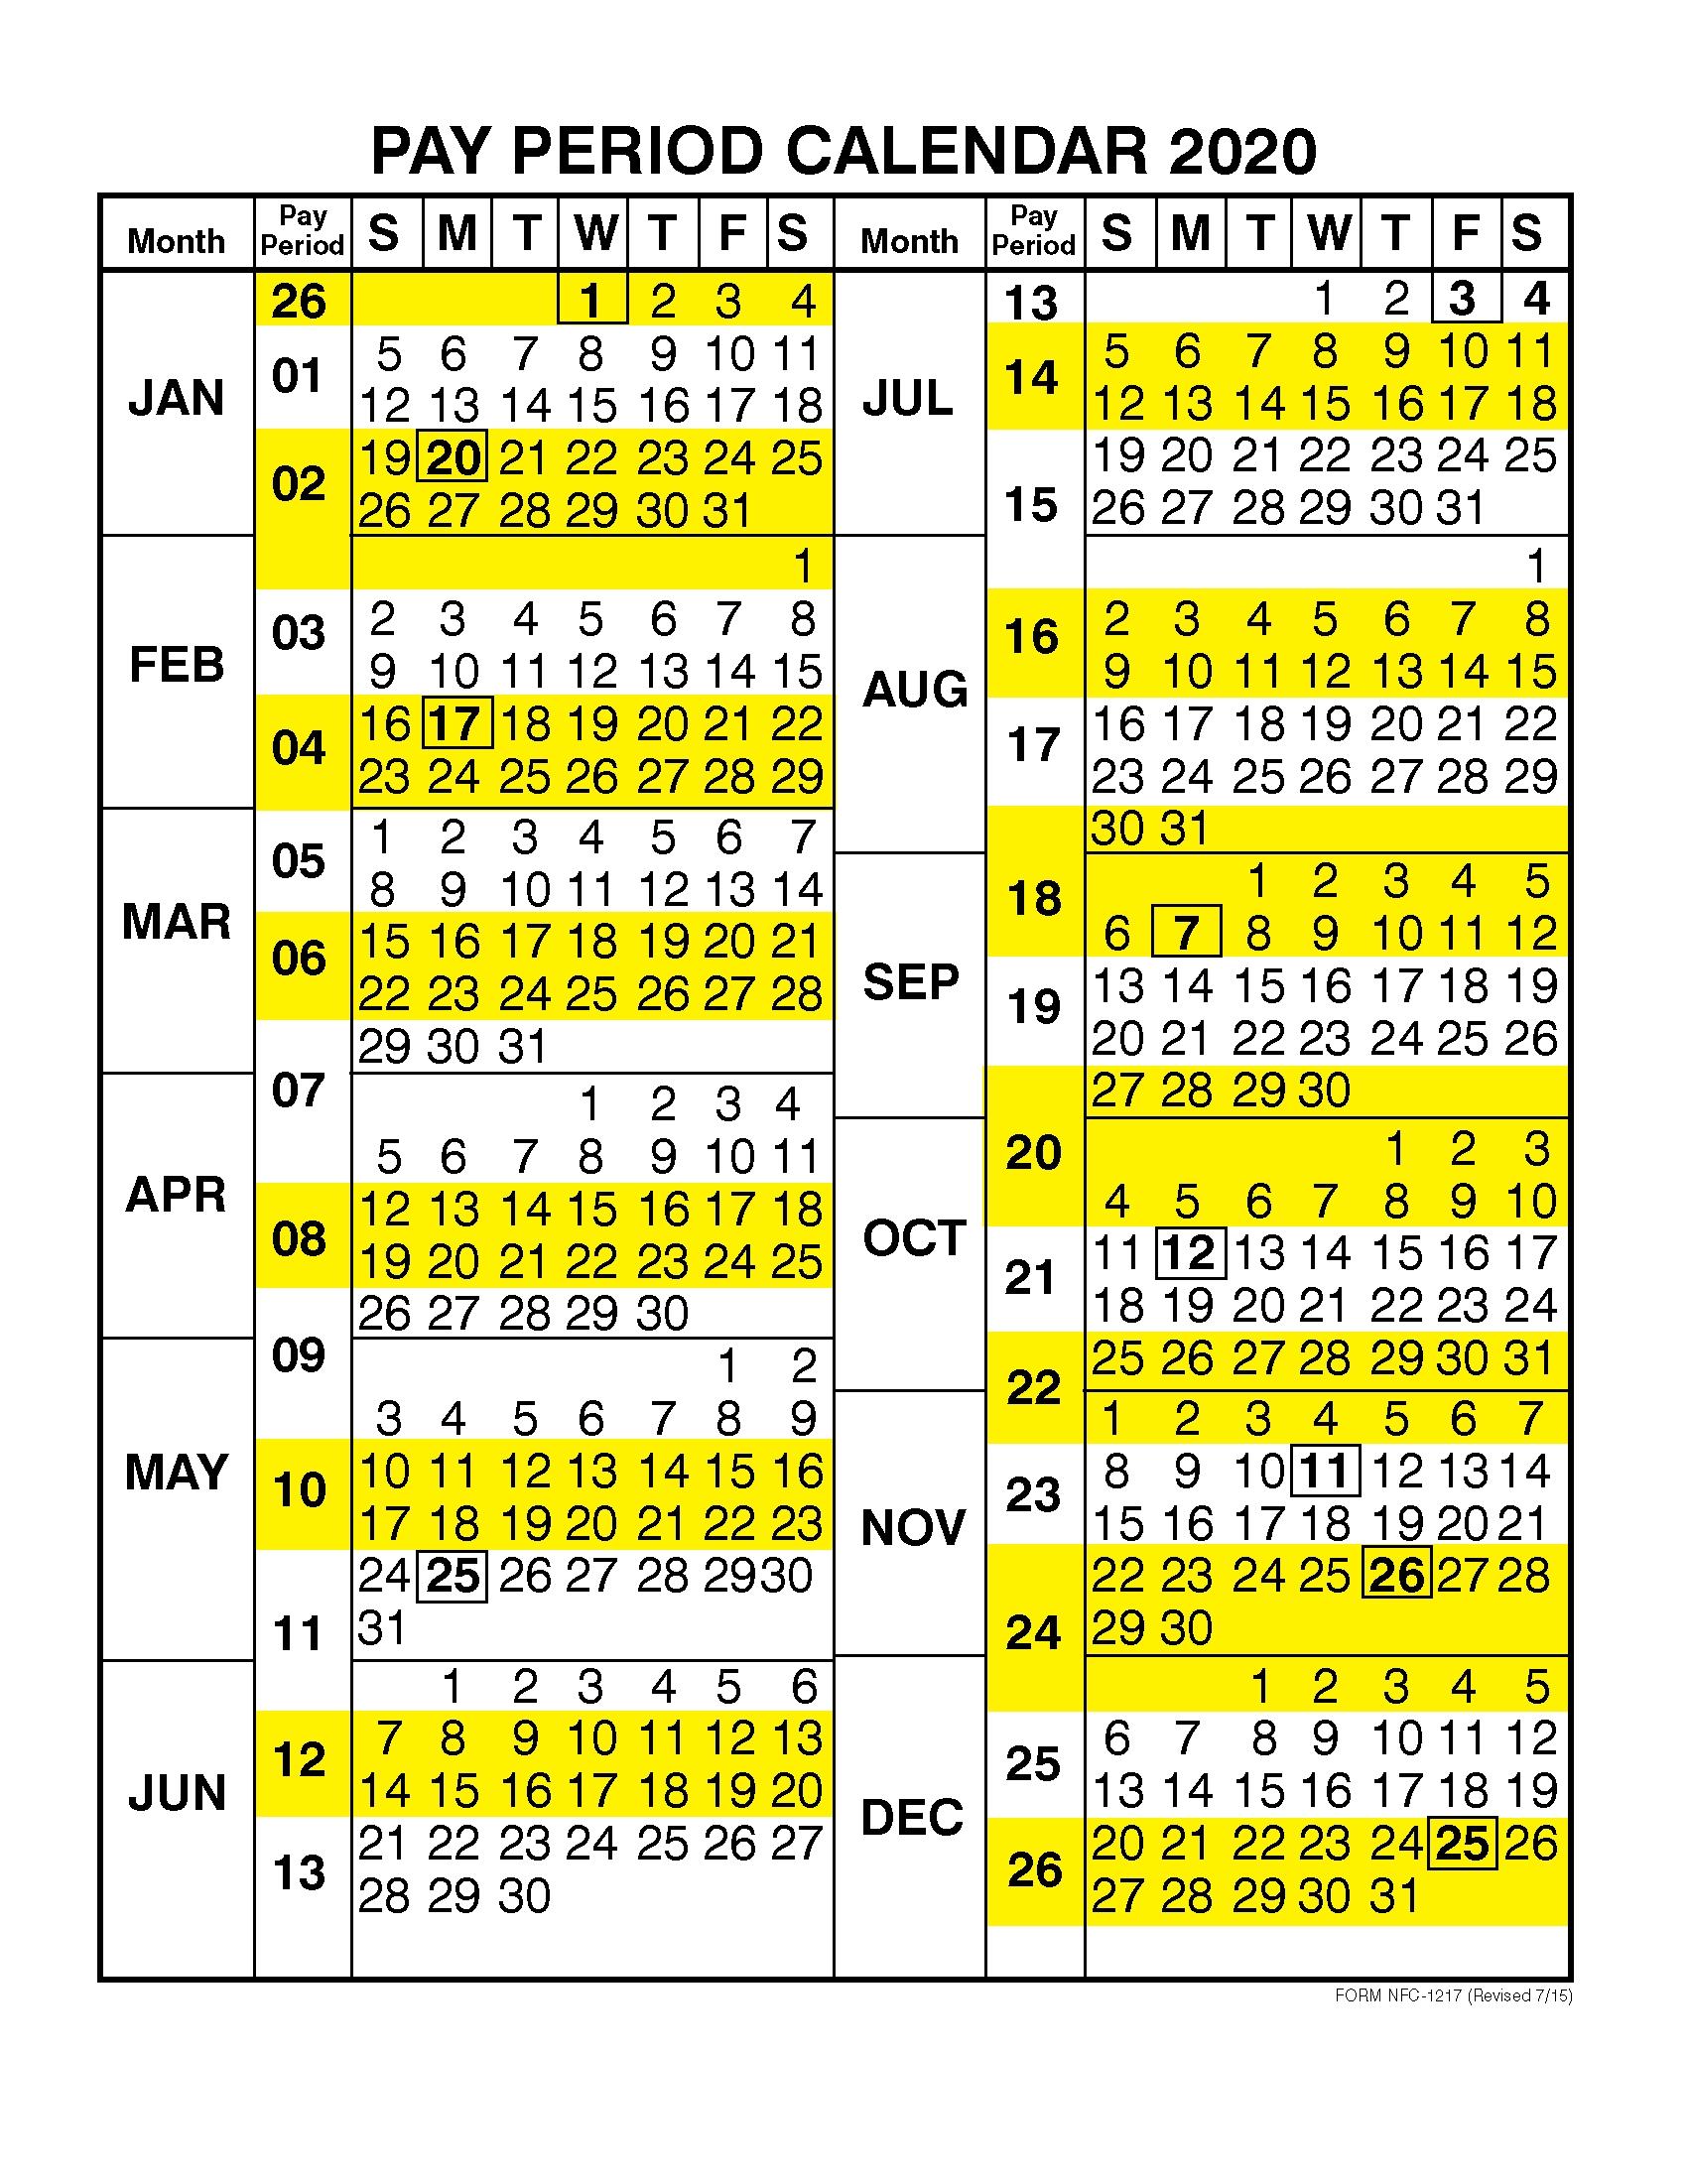 Dfas Payroll Calendar 2020 | 2021 Pay Periods Calendar  Federal Pay Period Calendar